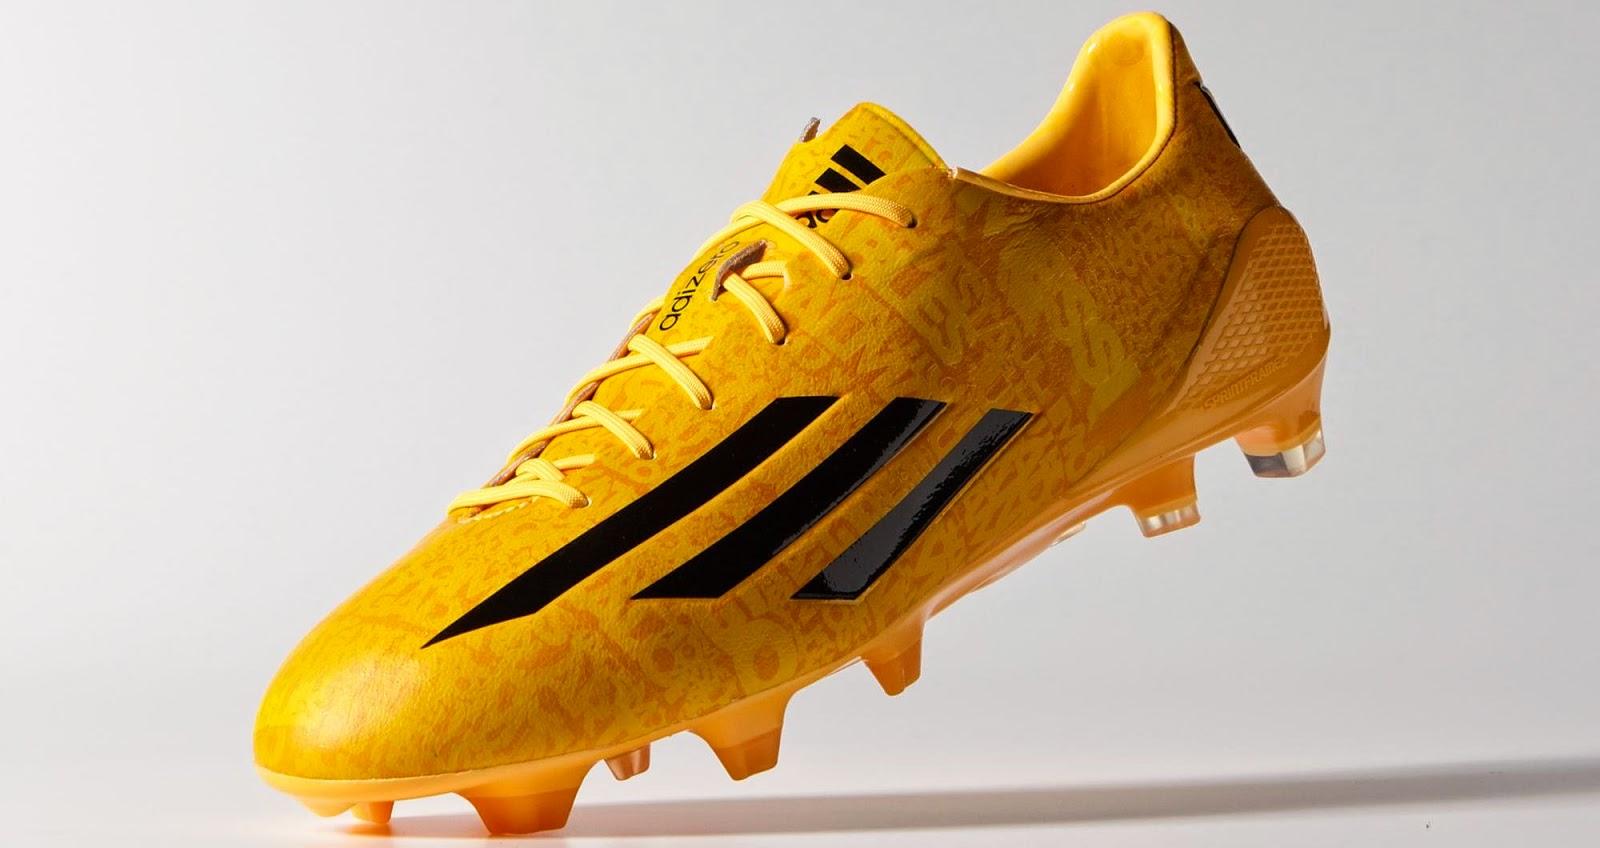 Adidas F50 adiZero 4 Messi Edition - solar gold-black-black - 3.jpg